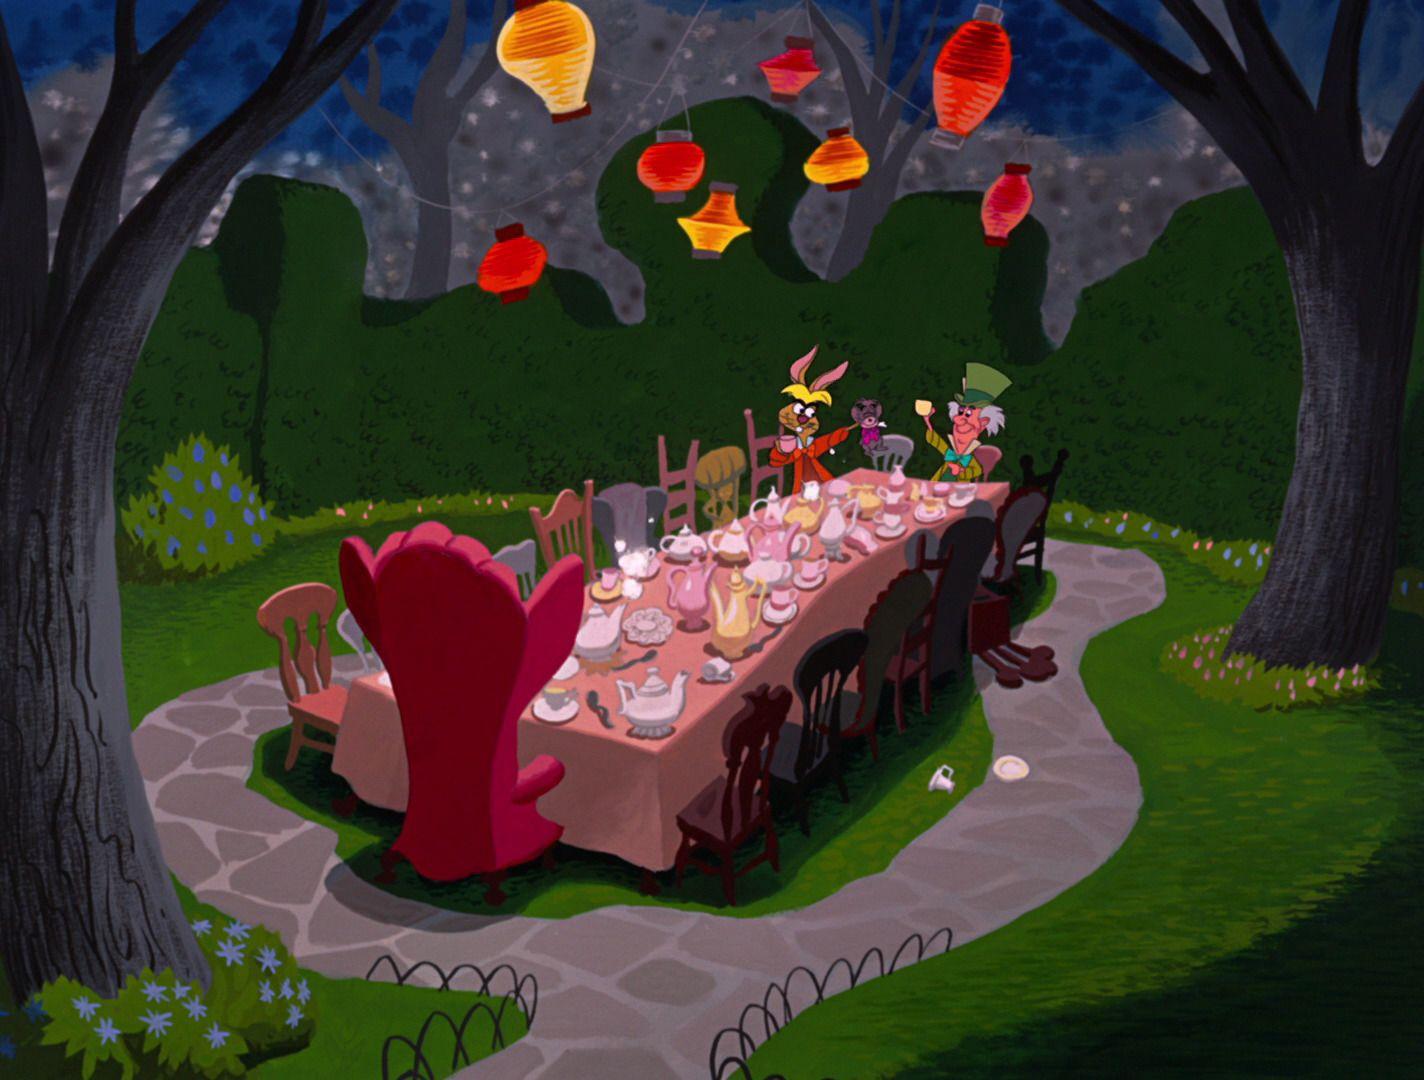 Mad Hatter Alice In Wonderland Tea Party Alice In Wonderland